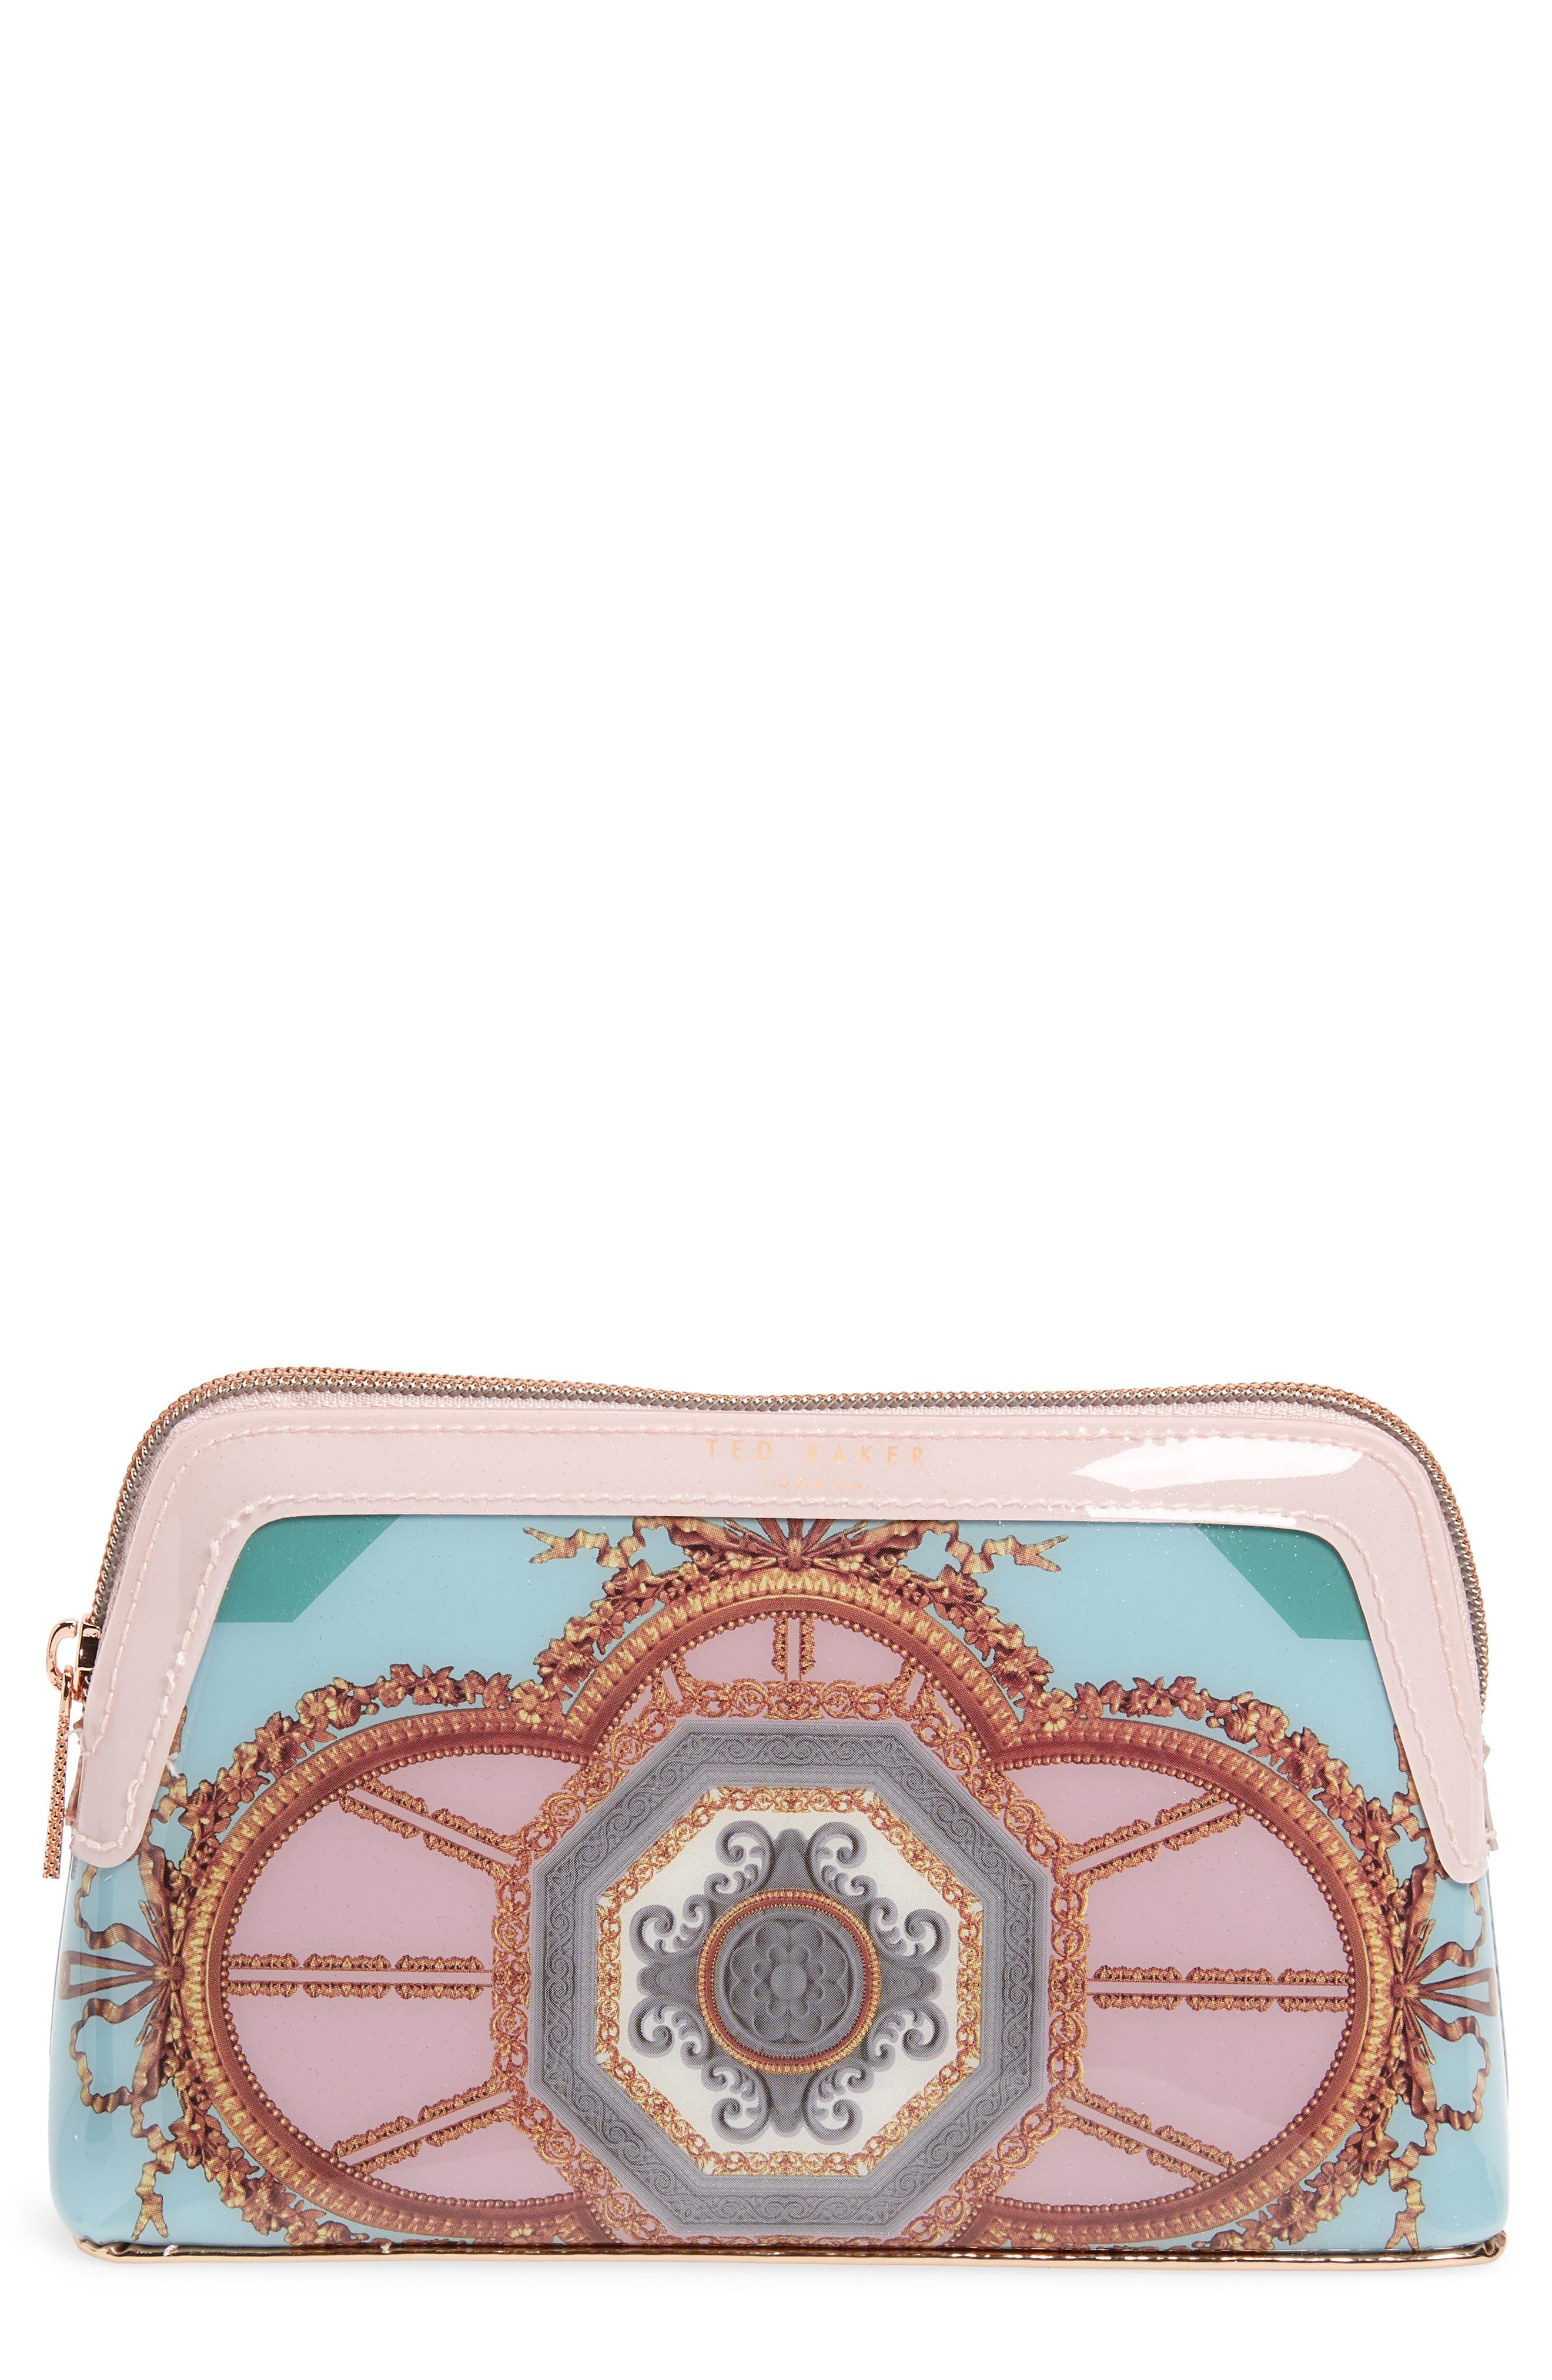 Dona Versailles Print Cosmetics Bag,                         Main,                         color, Teal